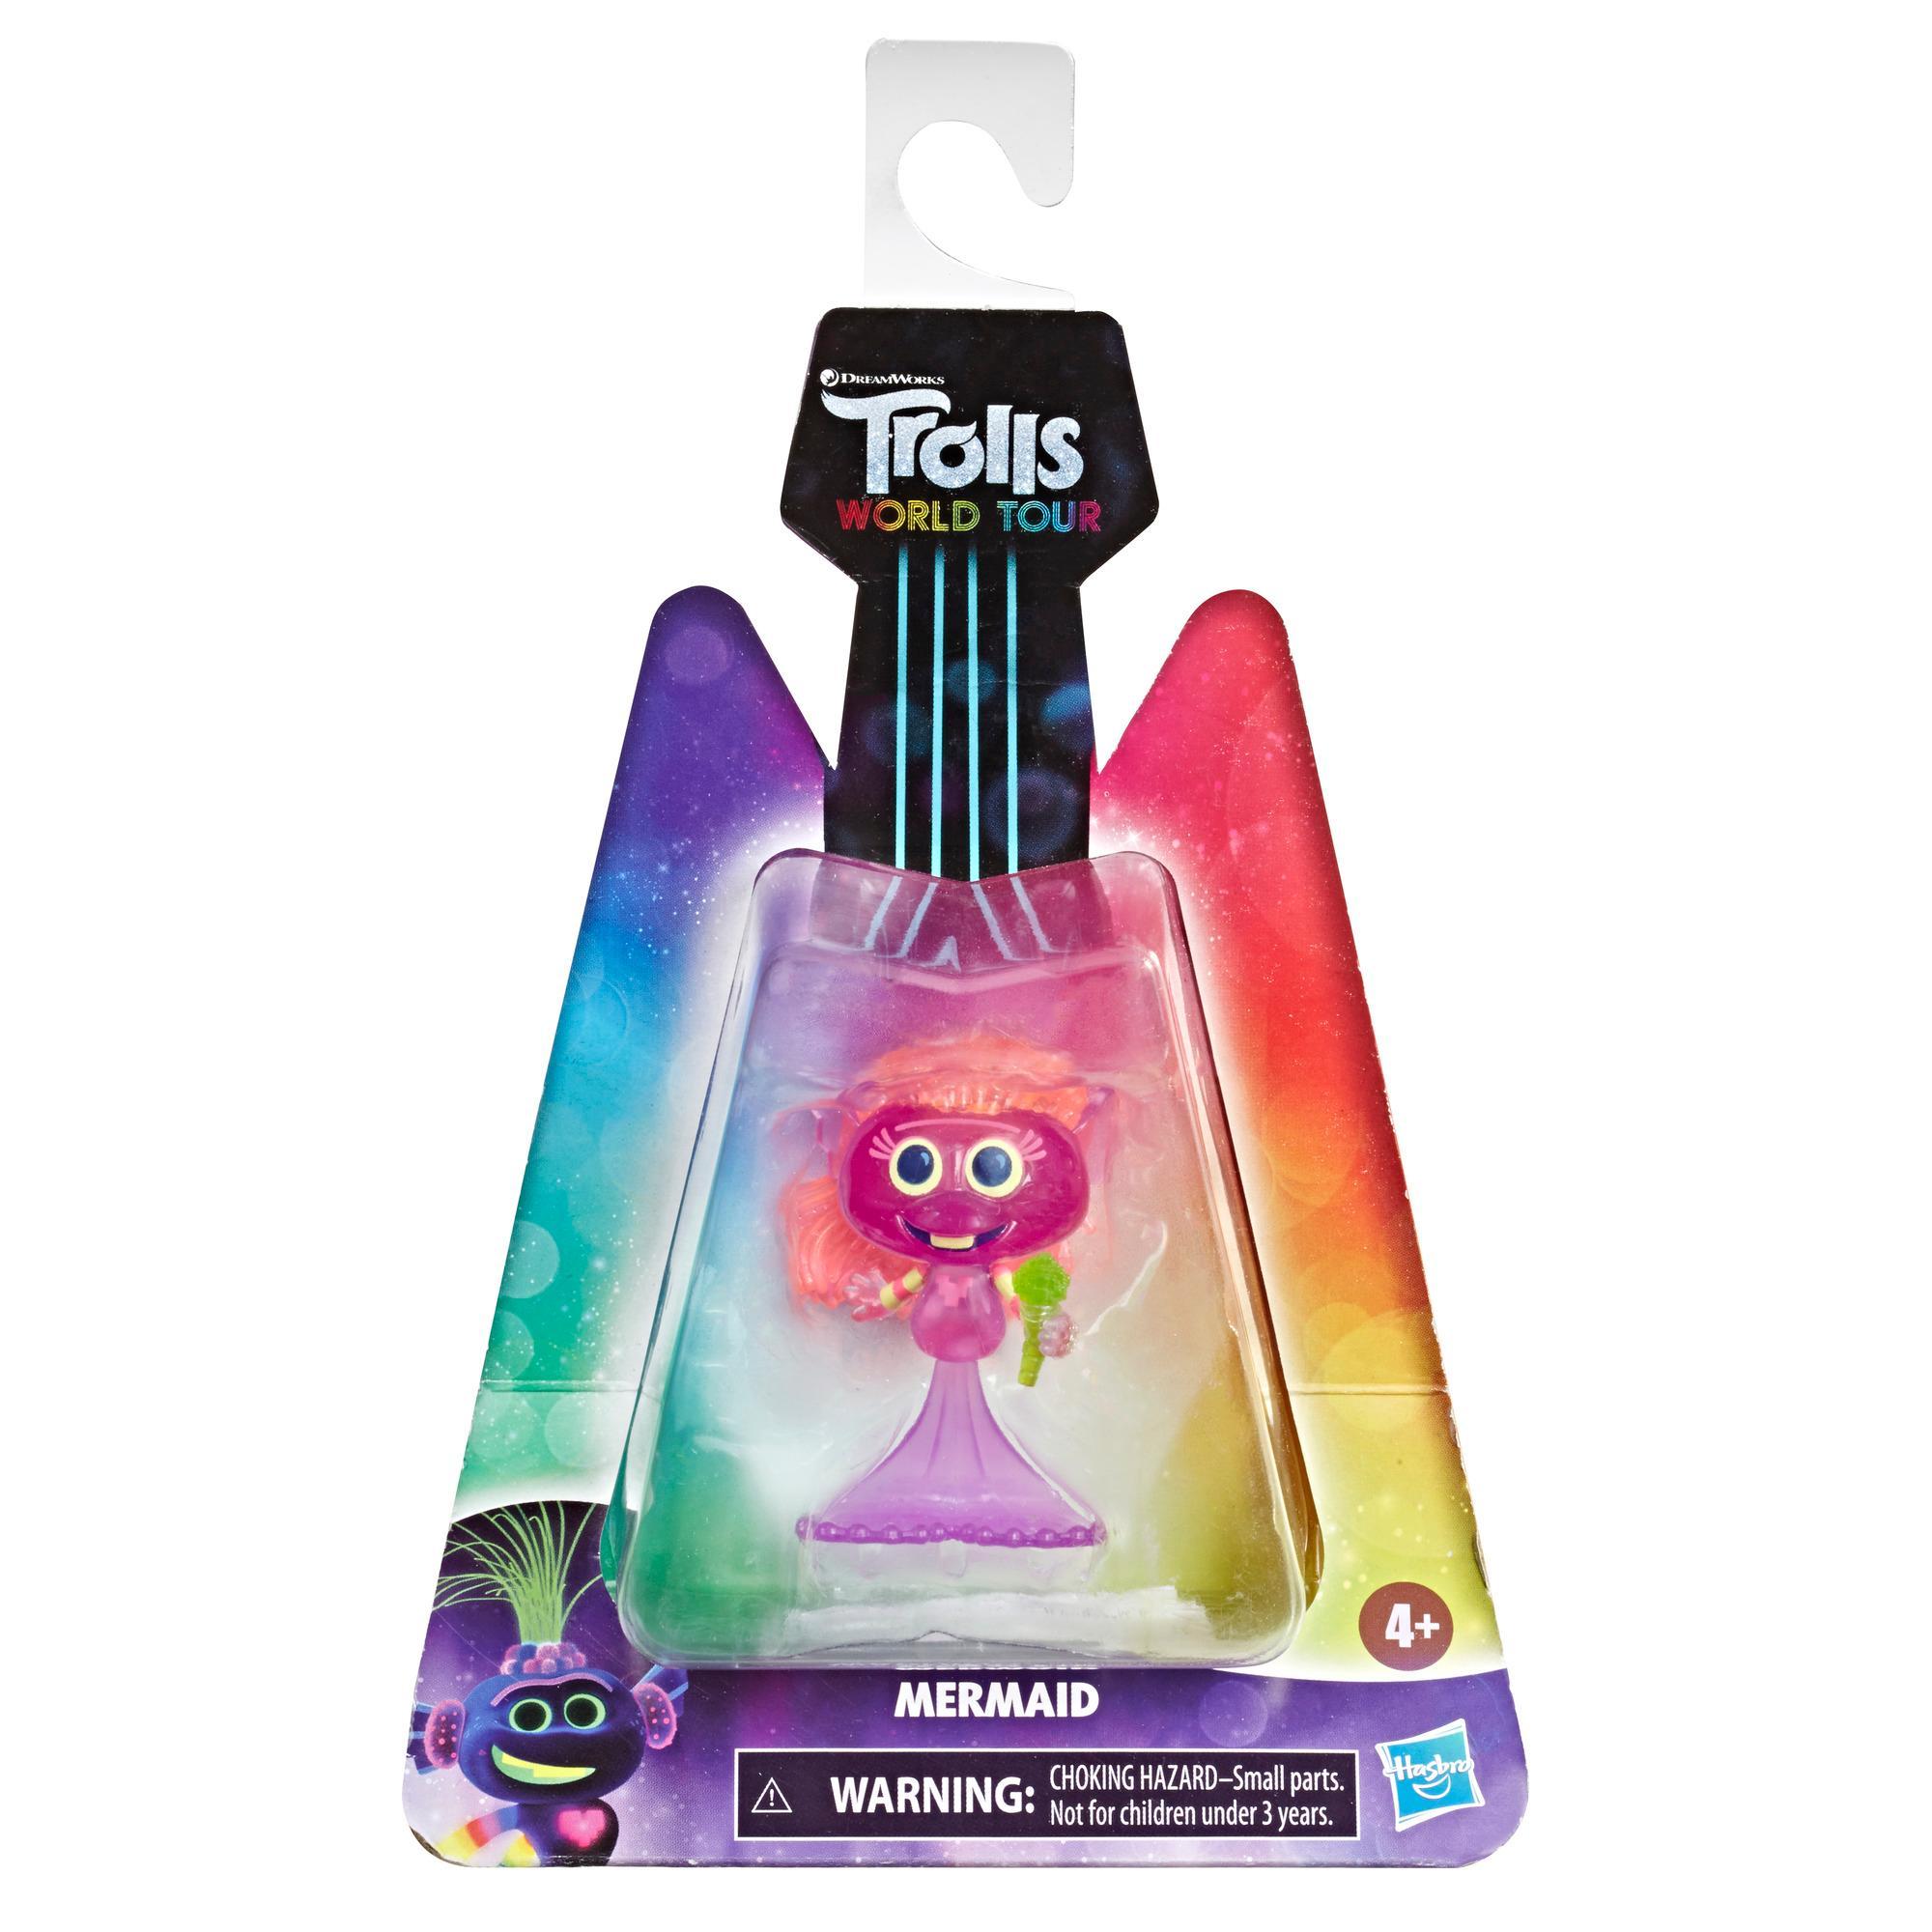 DreamWorks Trolls World Tour Meerjungfrau, Puppe mit Mikrofon, Spielzeug zum Film Trolls World Tour